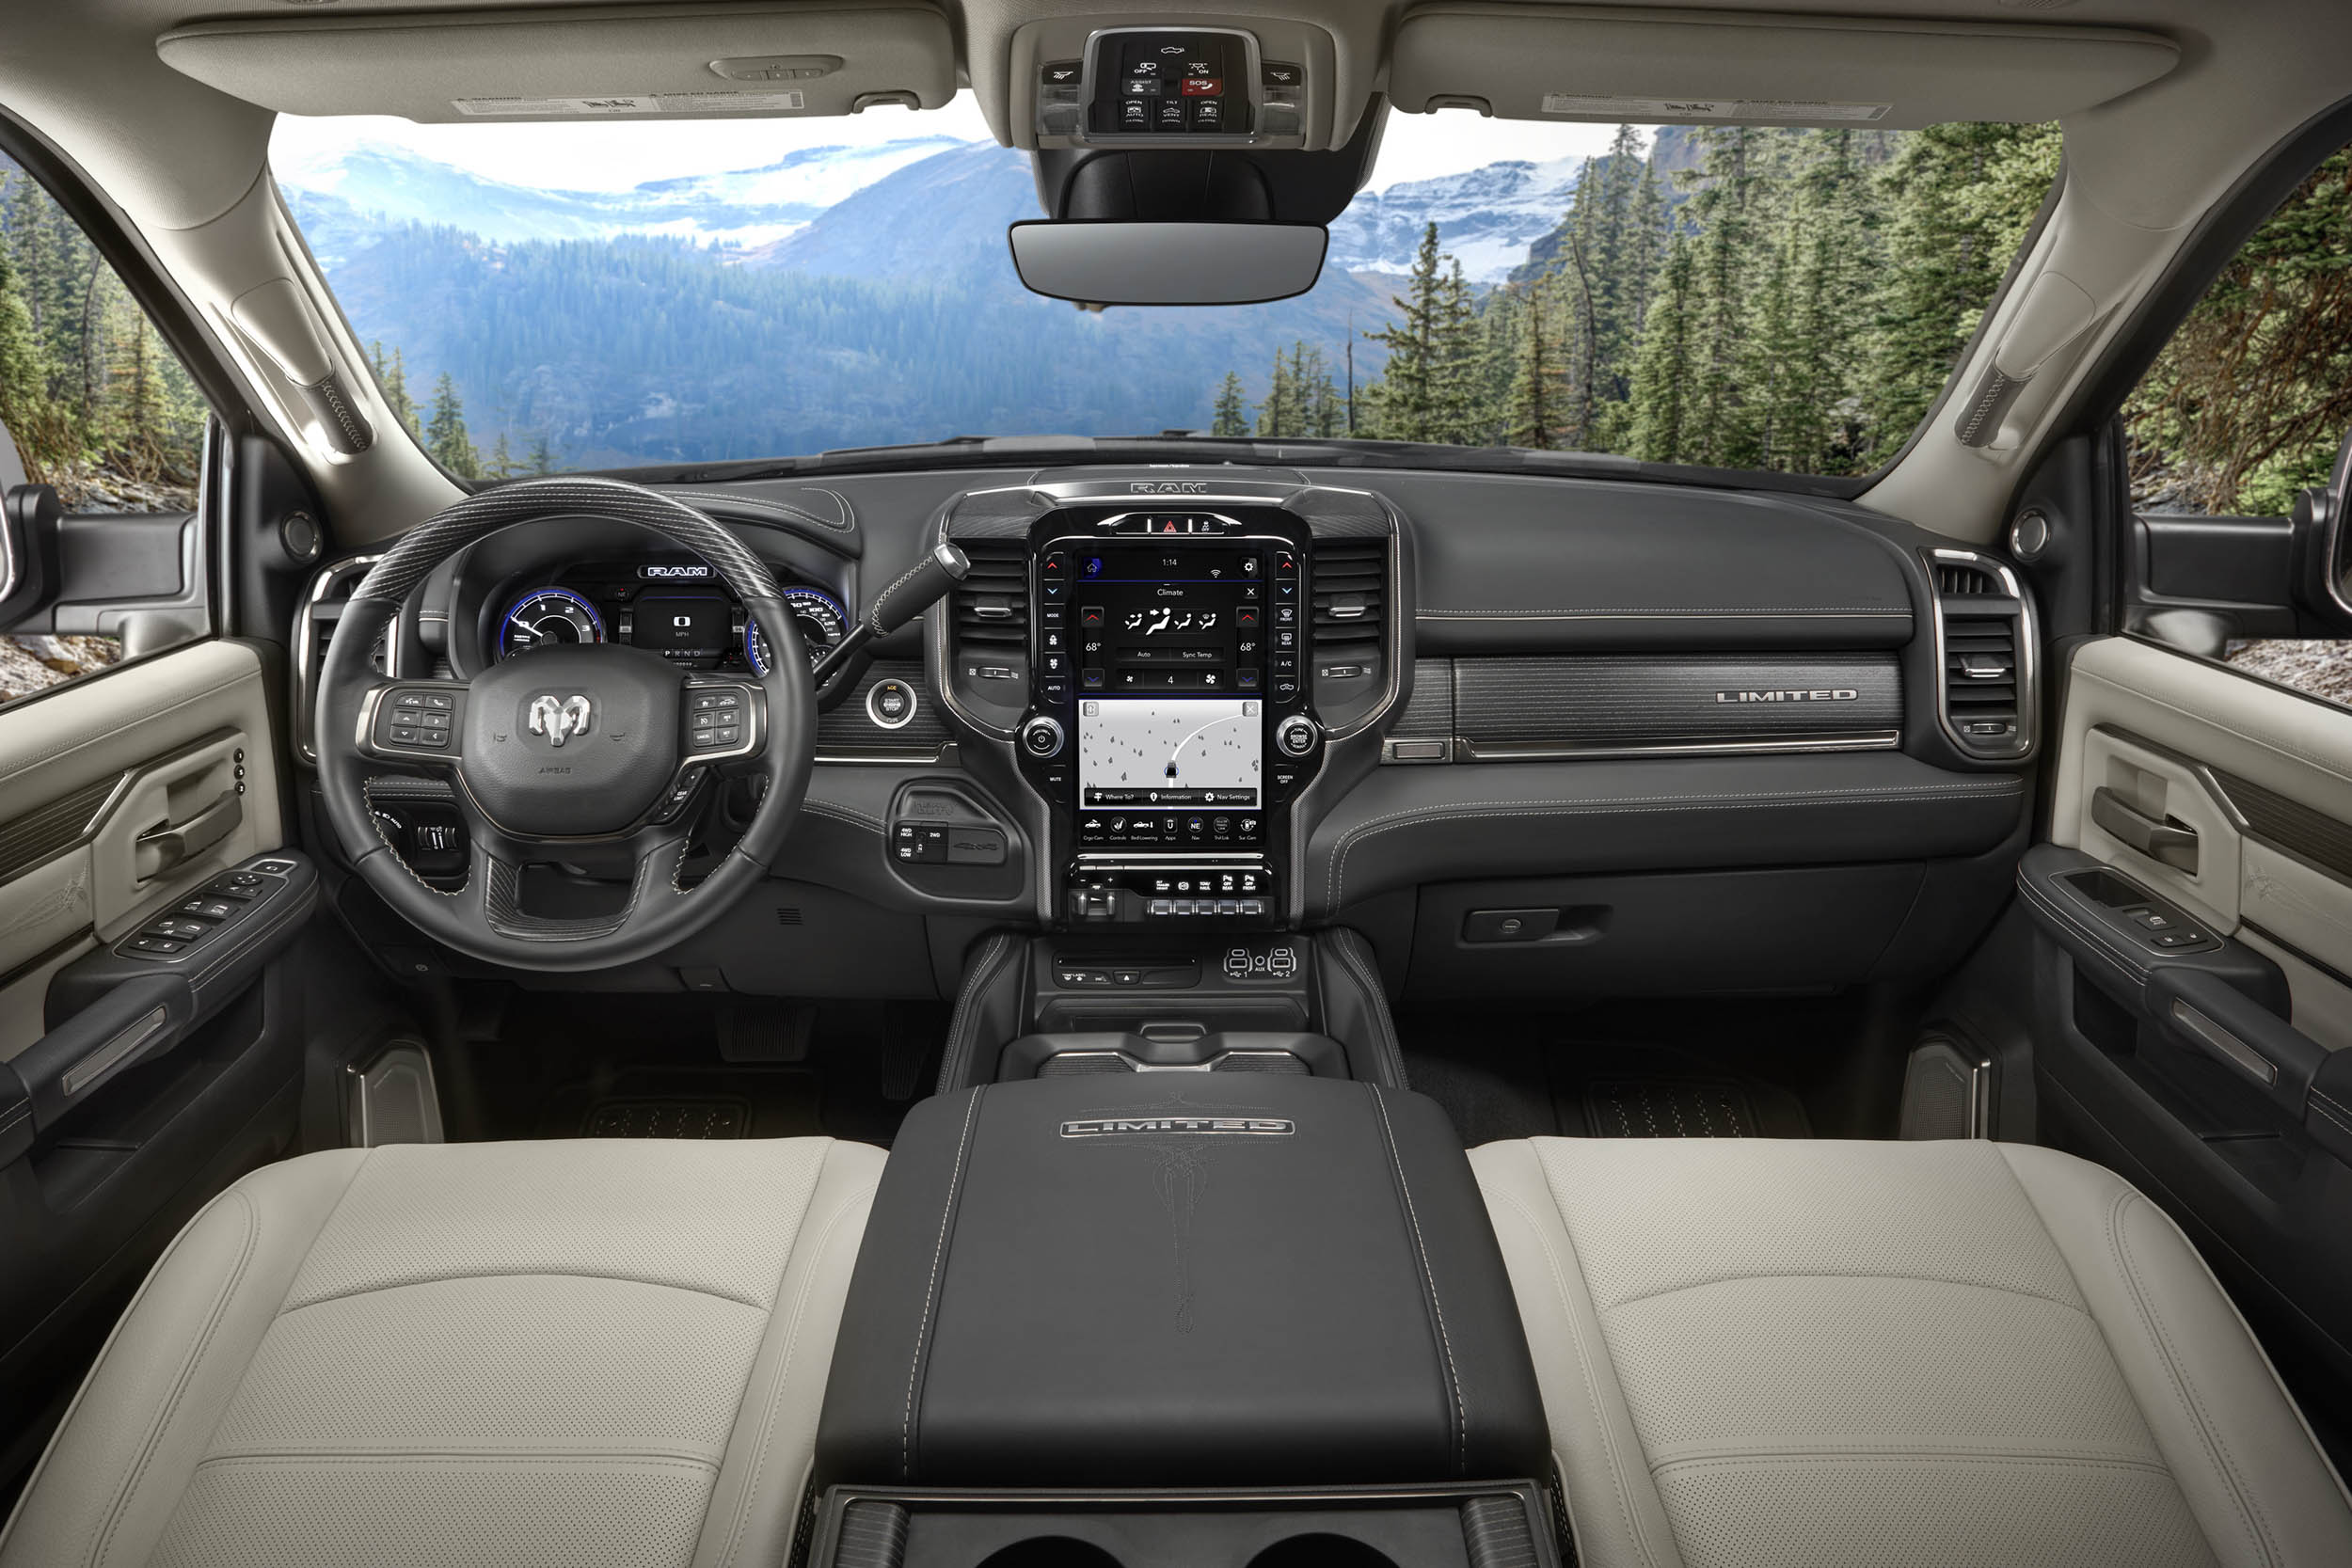 2019 RAM 2500 limited interior